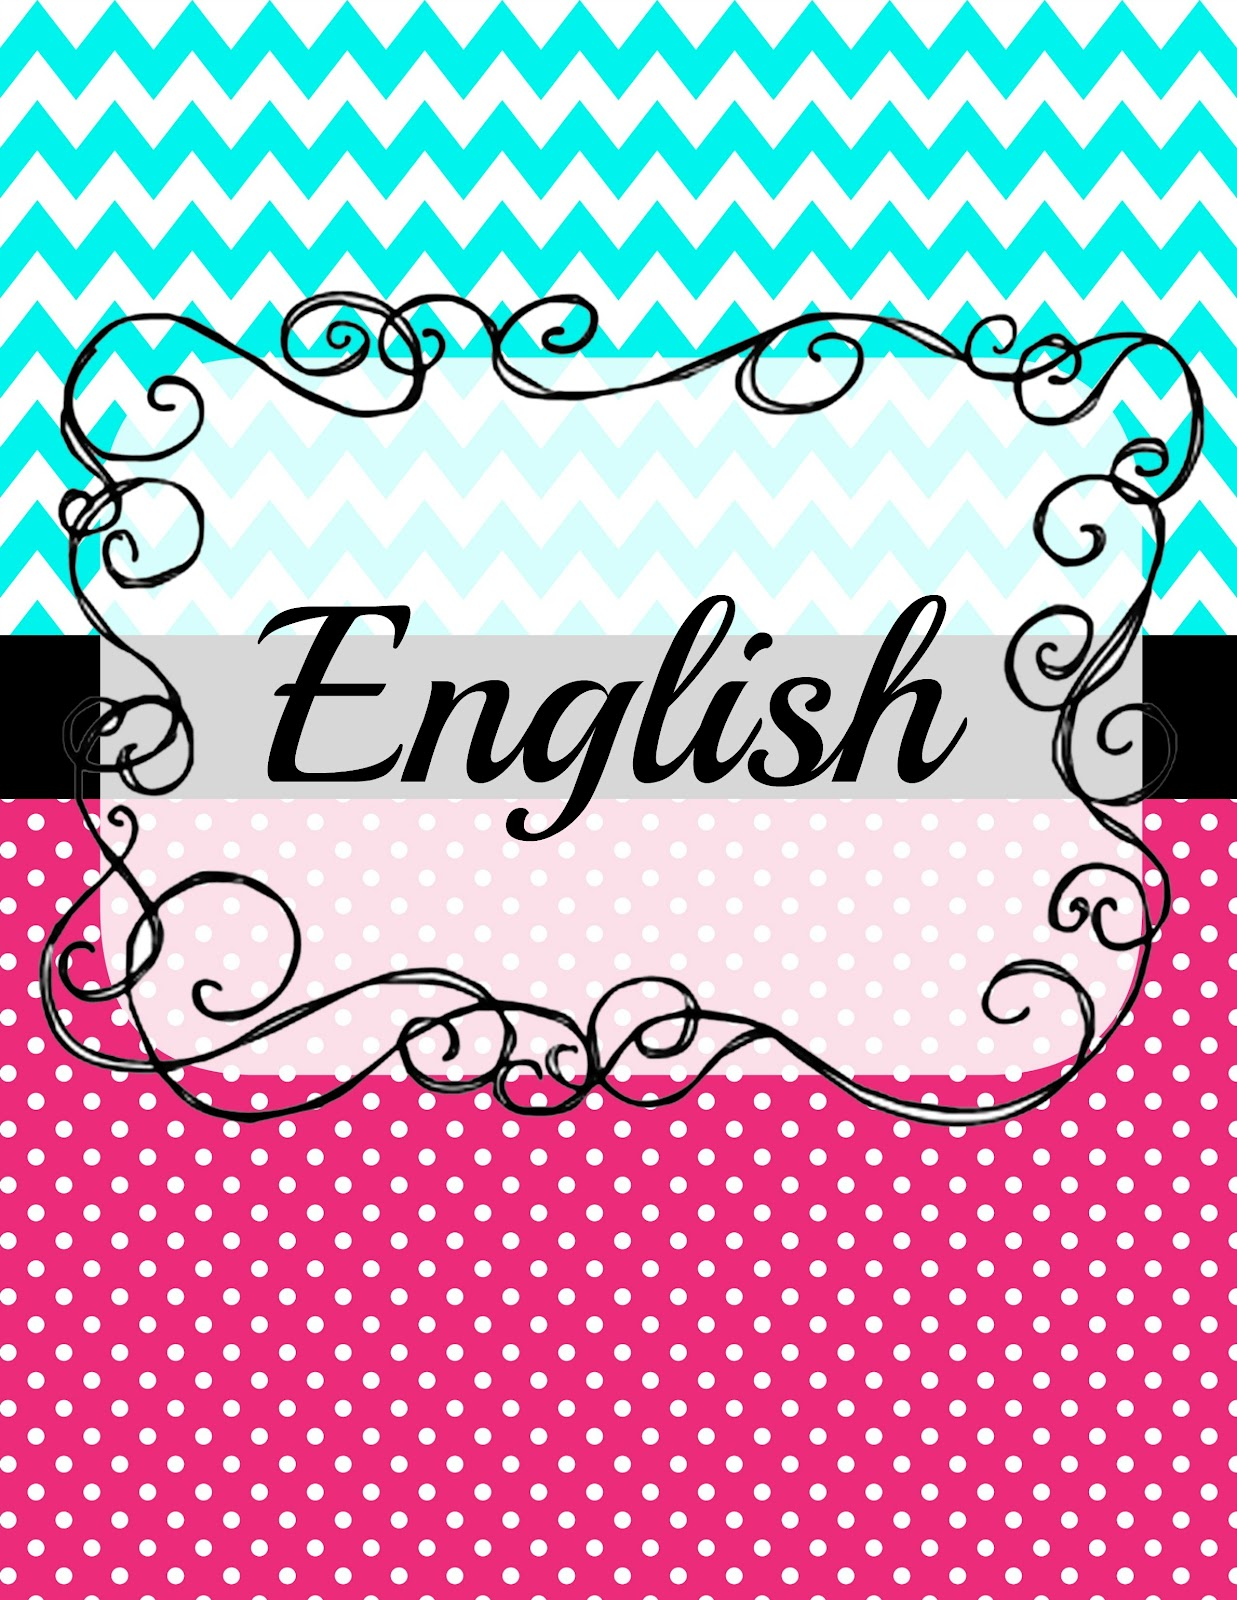 5 Pristine English Binder Cover